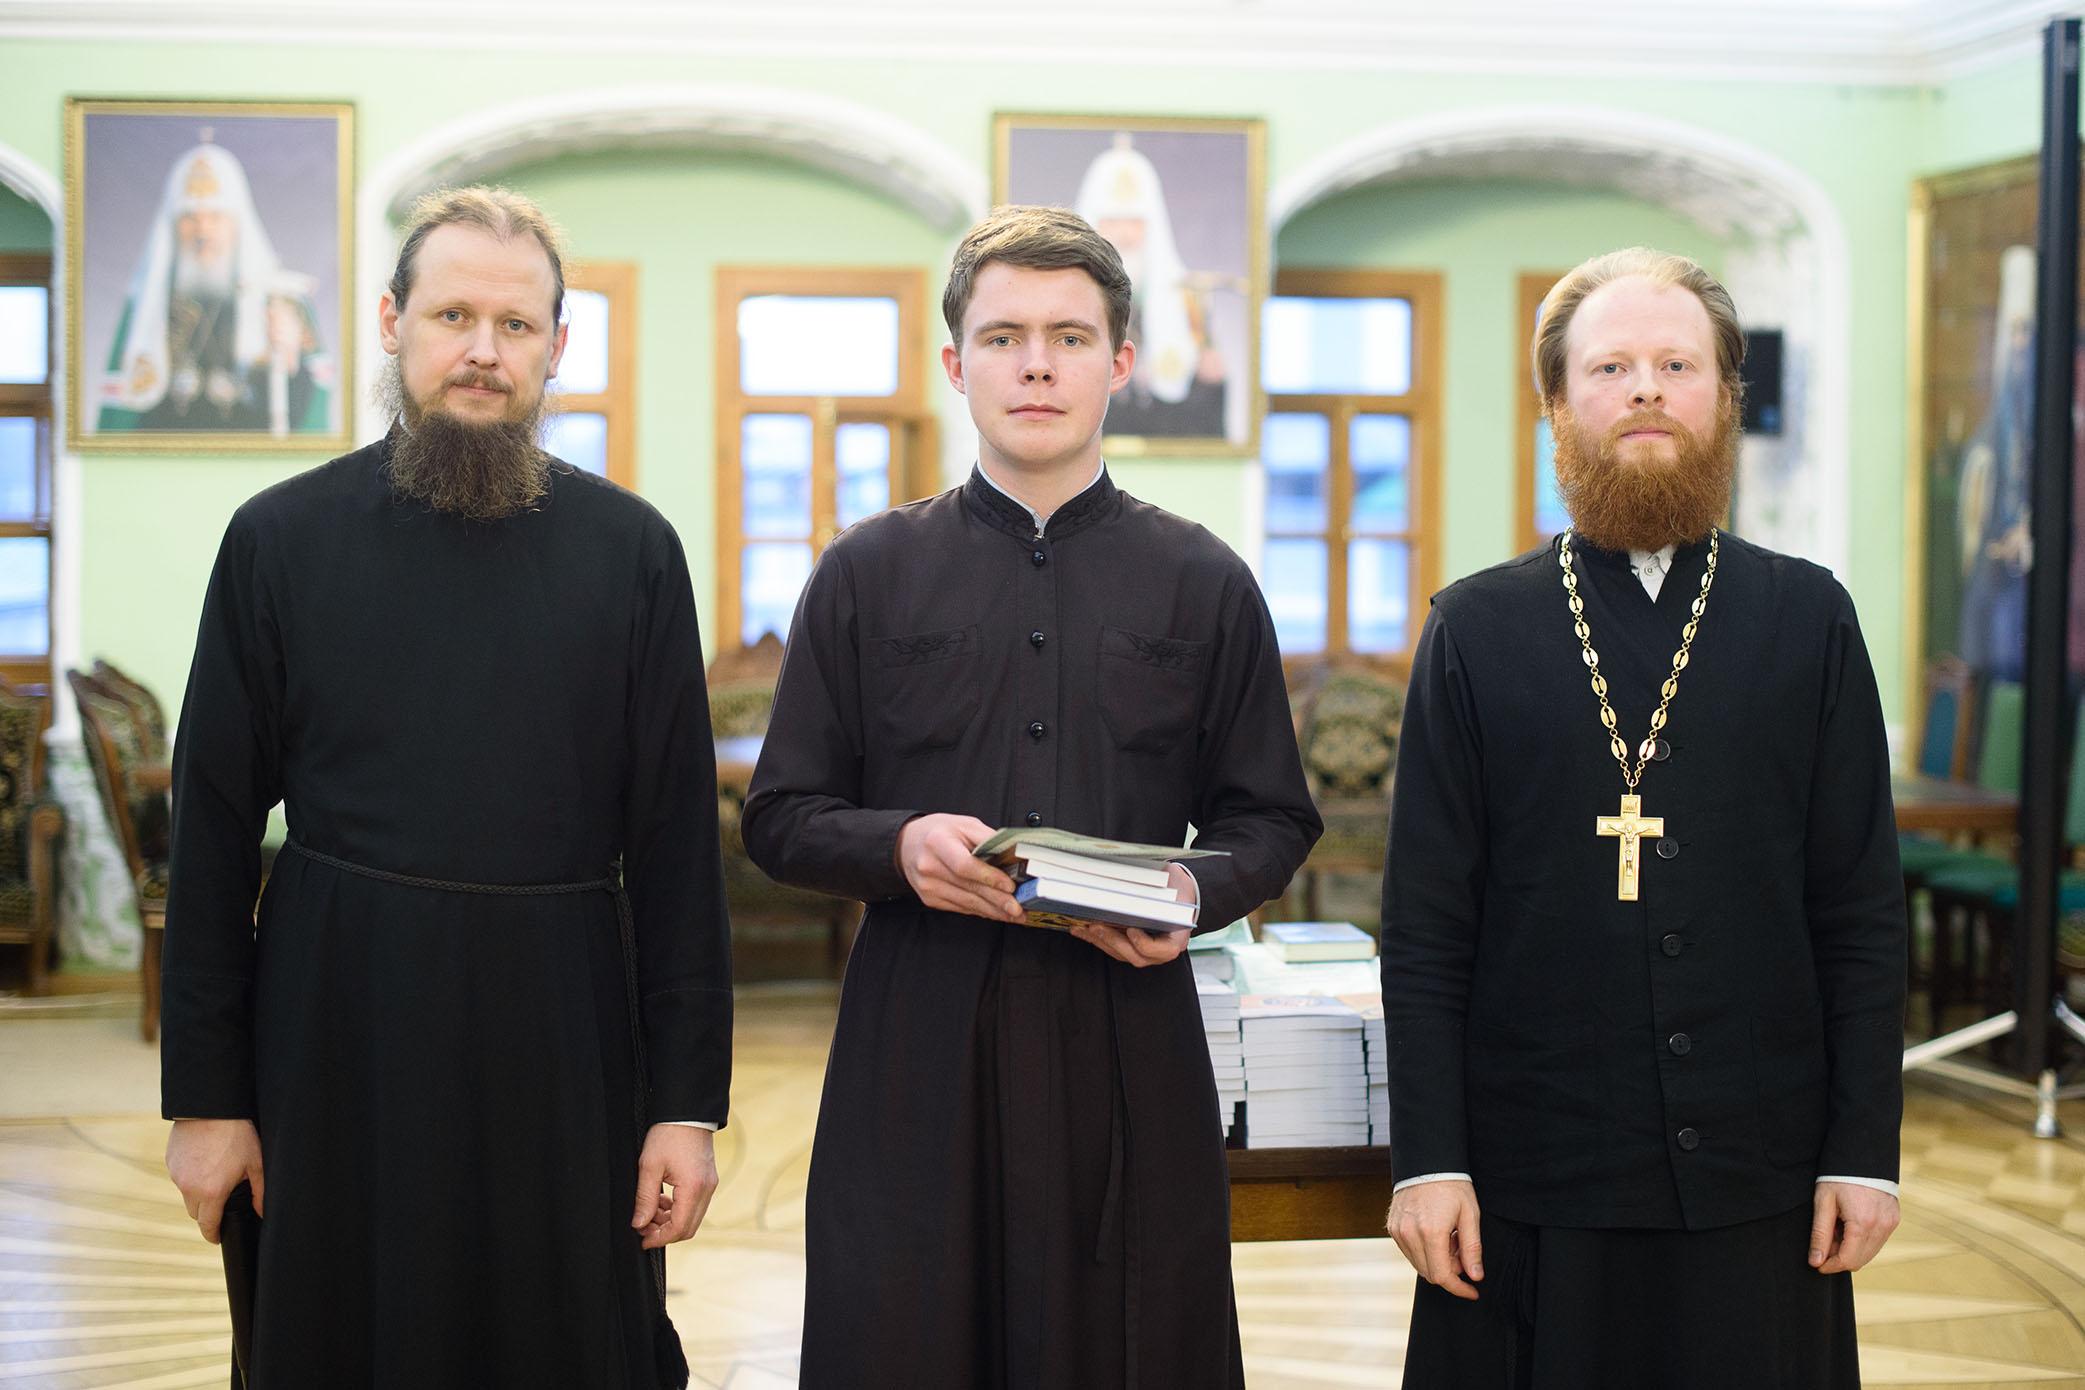 http://www.bel-seminaria.ru/sites/default/files/kss_0089.jpg